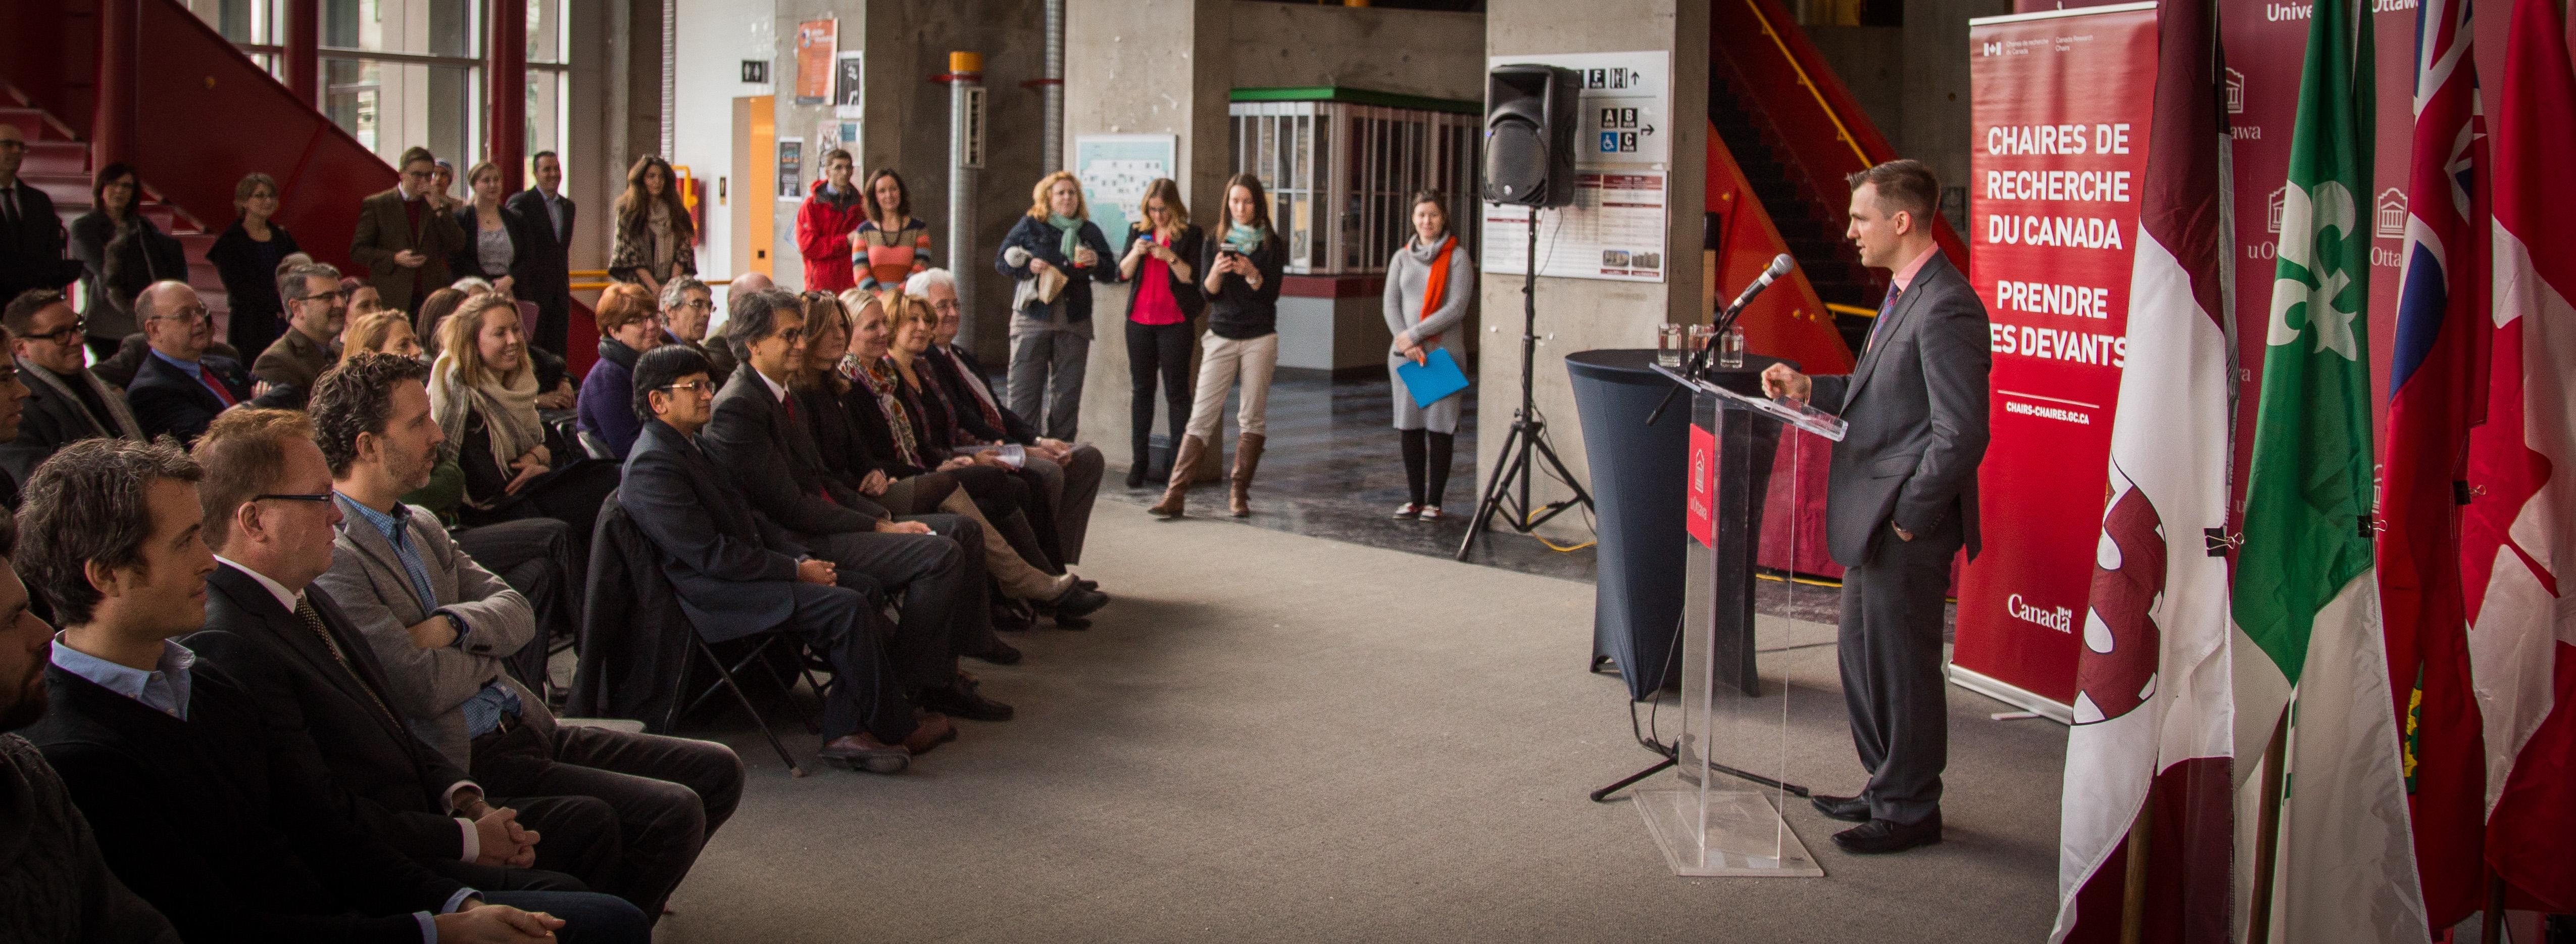 Professor Benoît Lessard speaks to crowd at CRC announcement